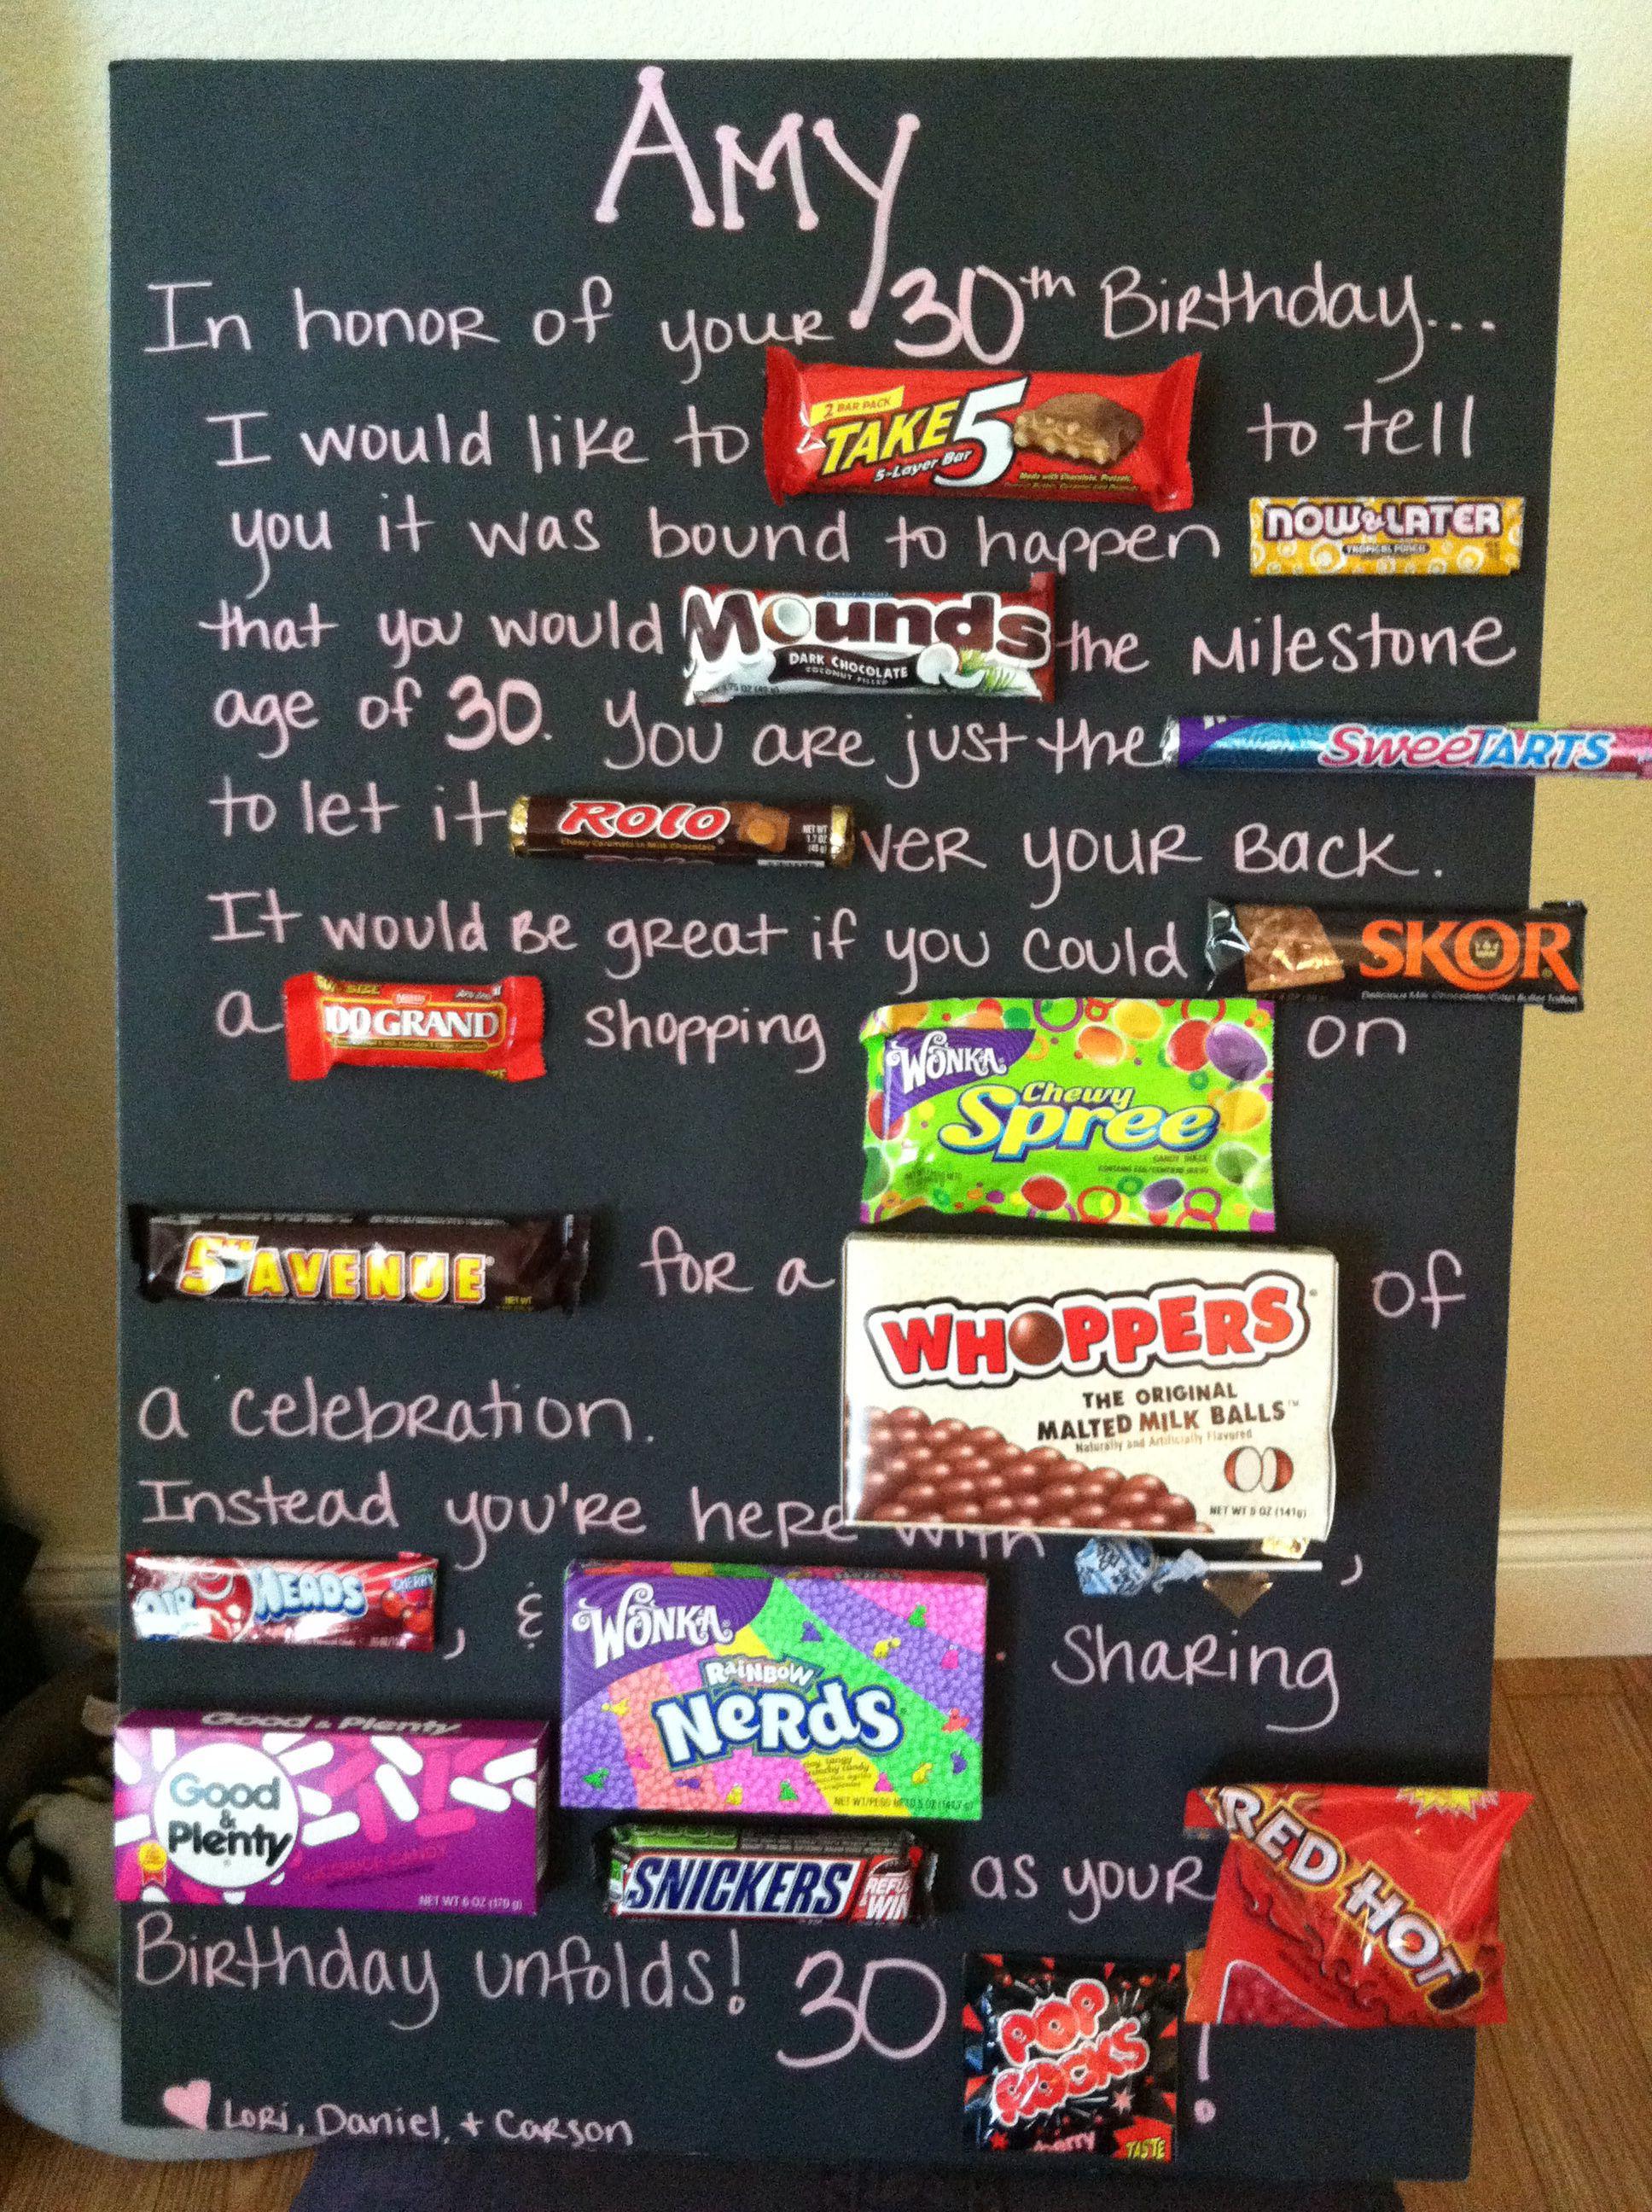 30th Birthday Idea  Parrrrrty  30th Birthday Gifts 30th Birthday Birthday candy posters